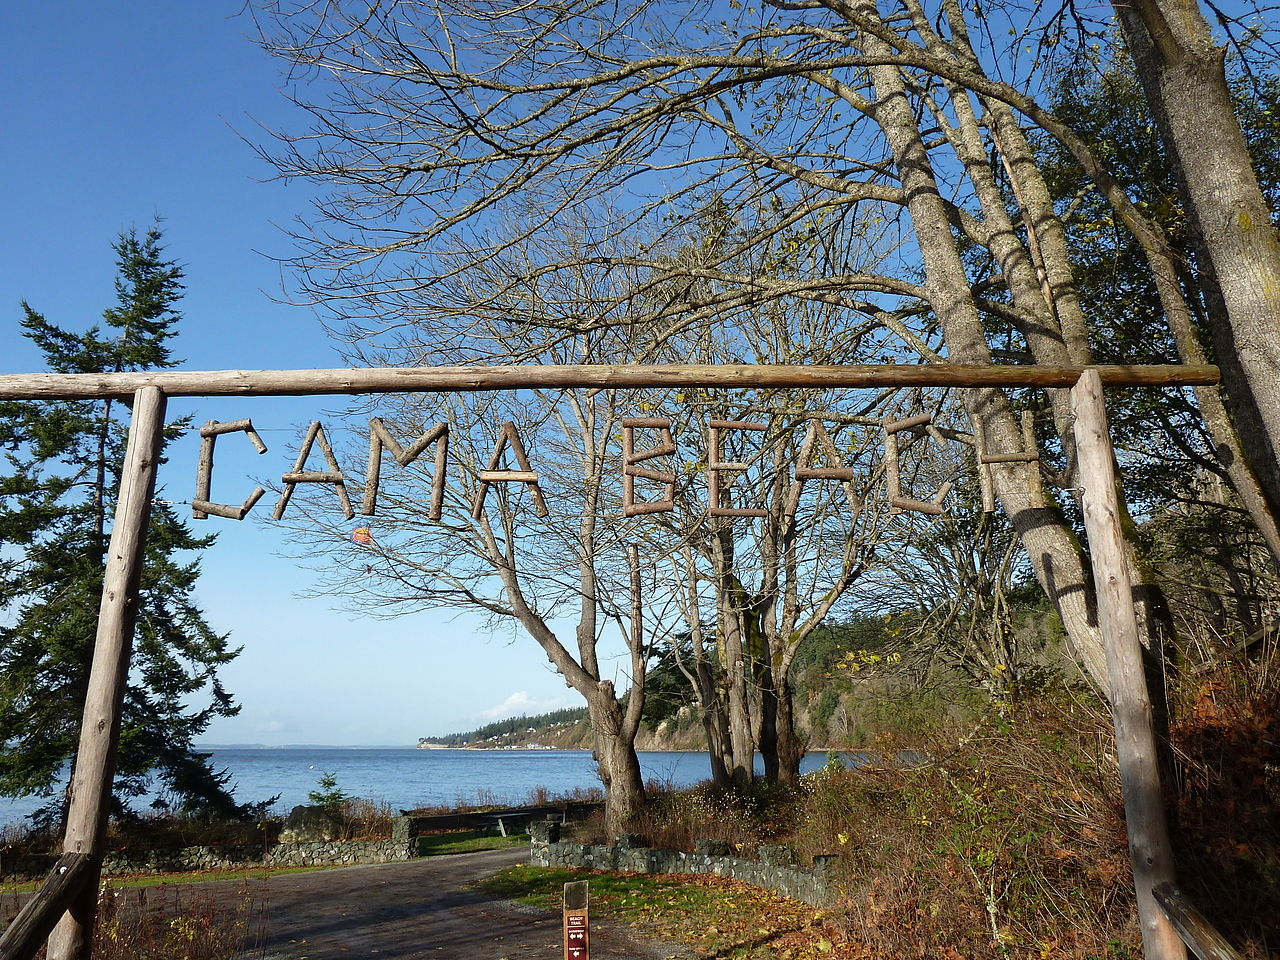 File cama beach resort sign jpg wikimedia commons for Cama wikipedia